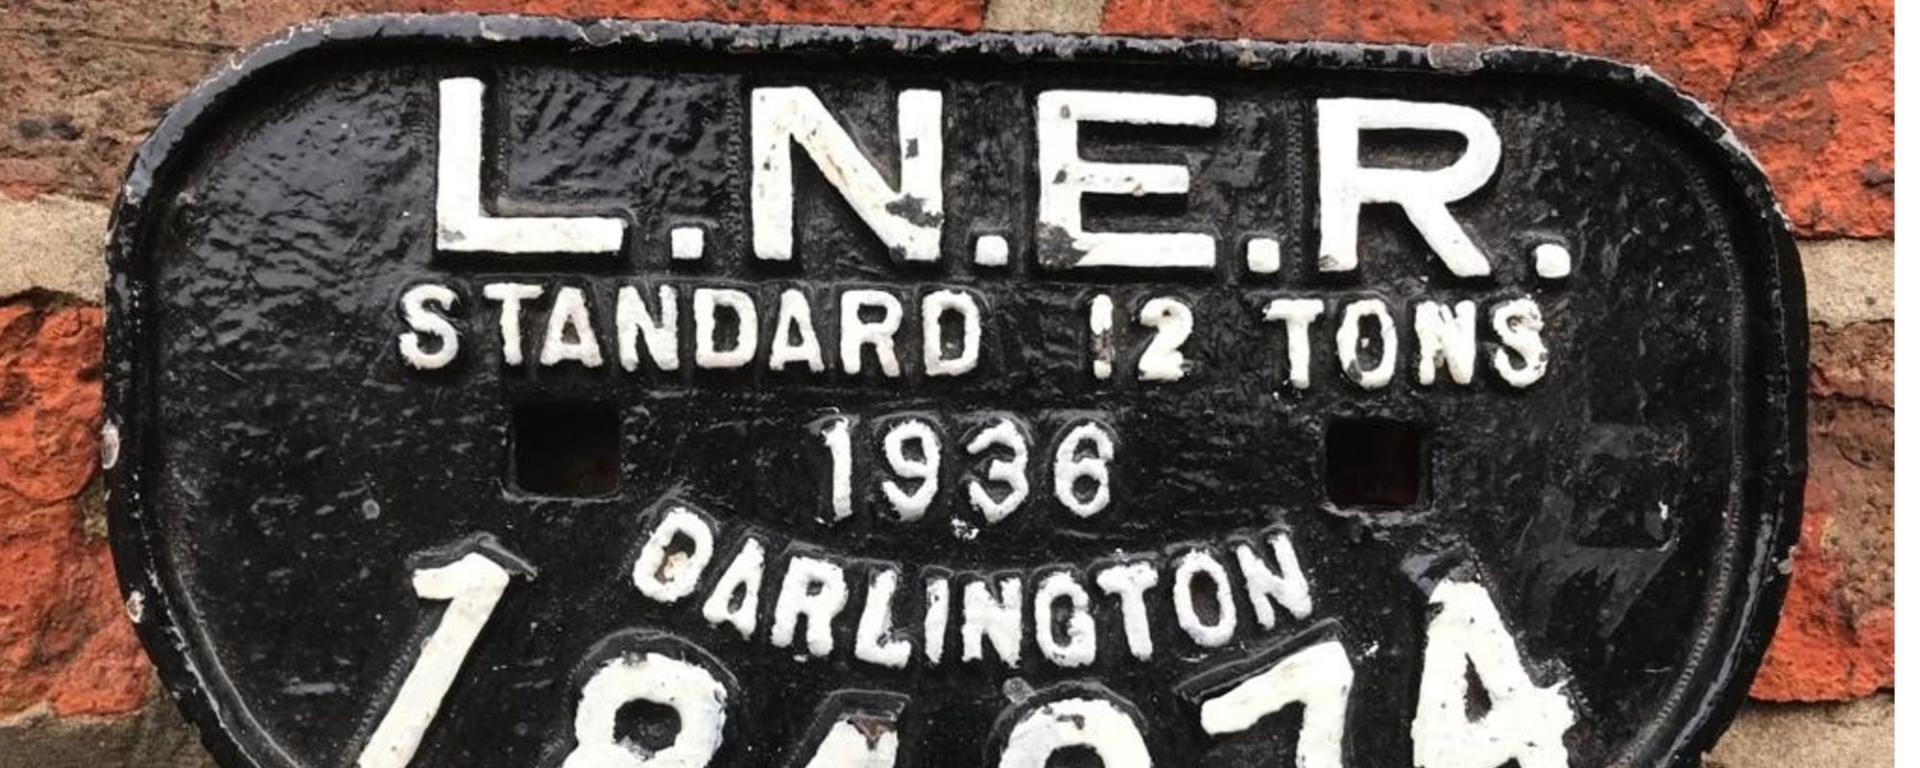 Stockton And Darlington Railway Sign